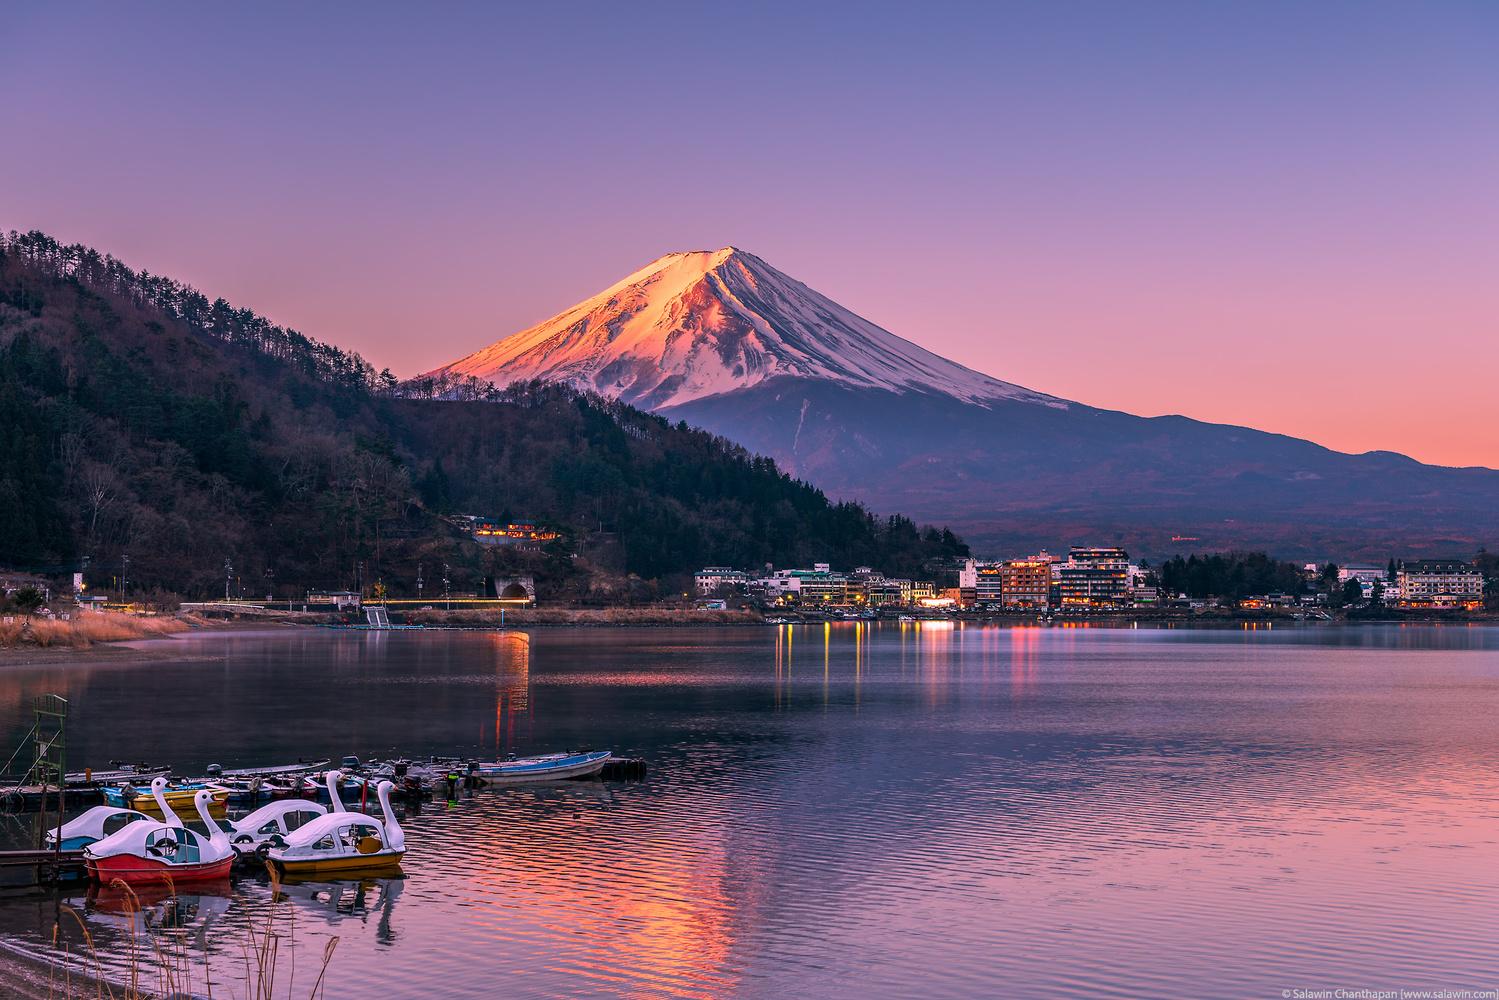 First Light Hitting the Summit of Mount Fuji at Lake Kawaguchi by Salawin Chanthapan